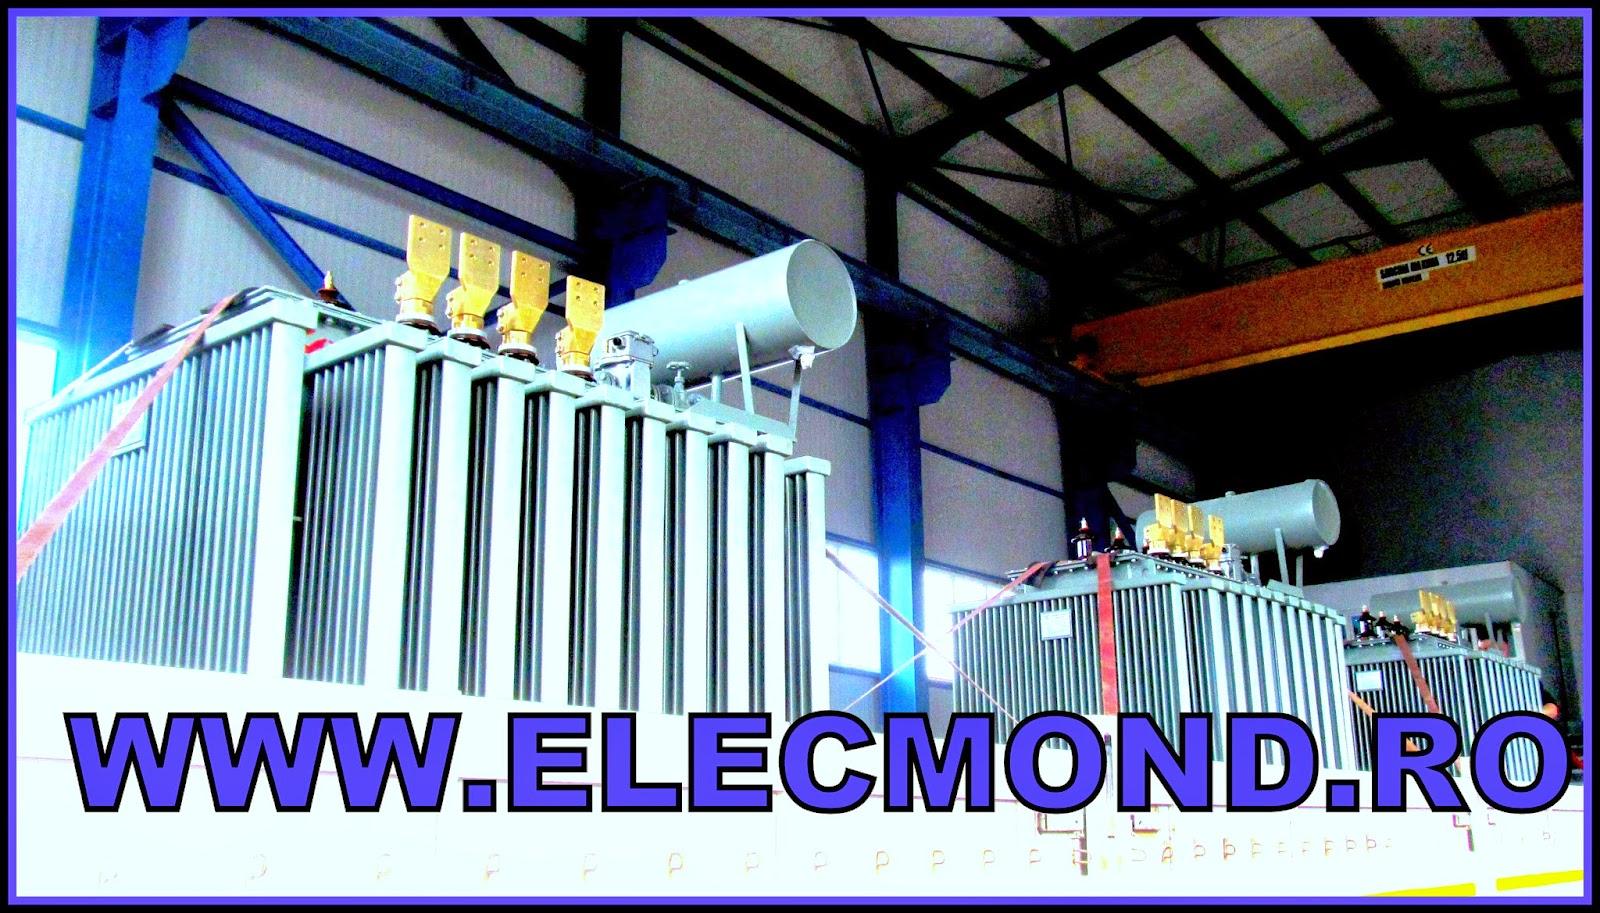 Transformatoare 1600 kVA 6/0,4 kV Cupru , transformator 1600 kVA Cupru  6/0,4 kV , Elecmond Electric , trafo , transformator